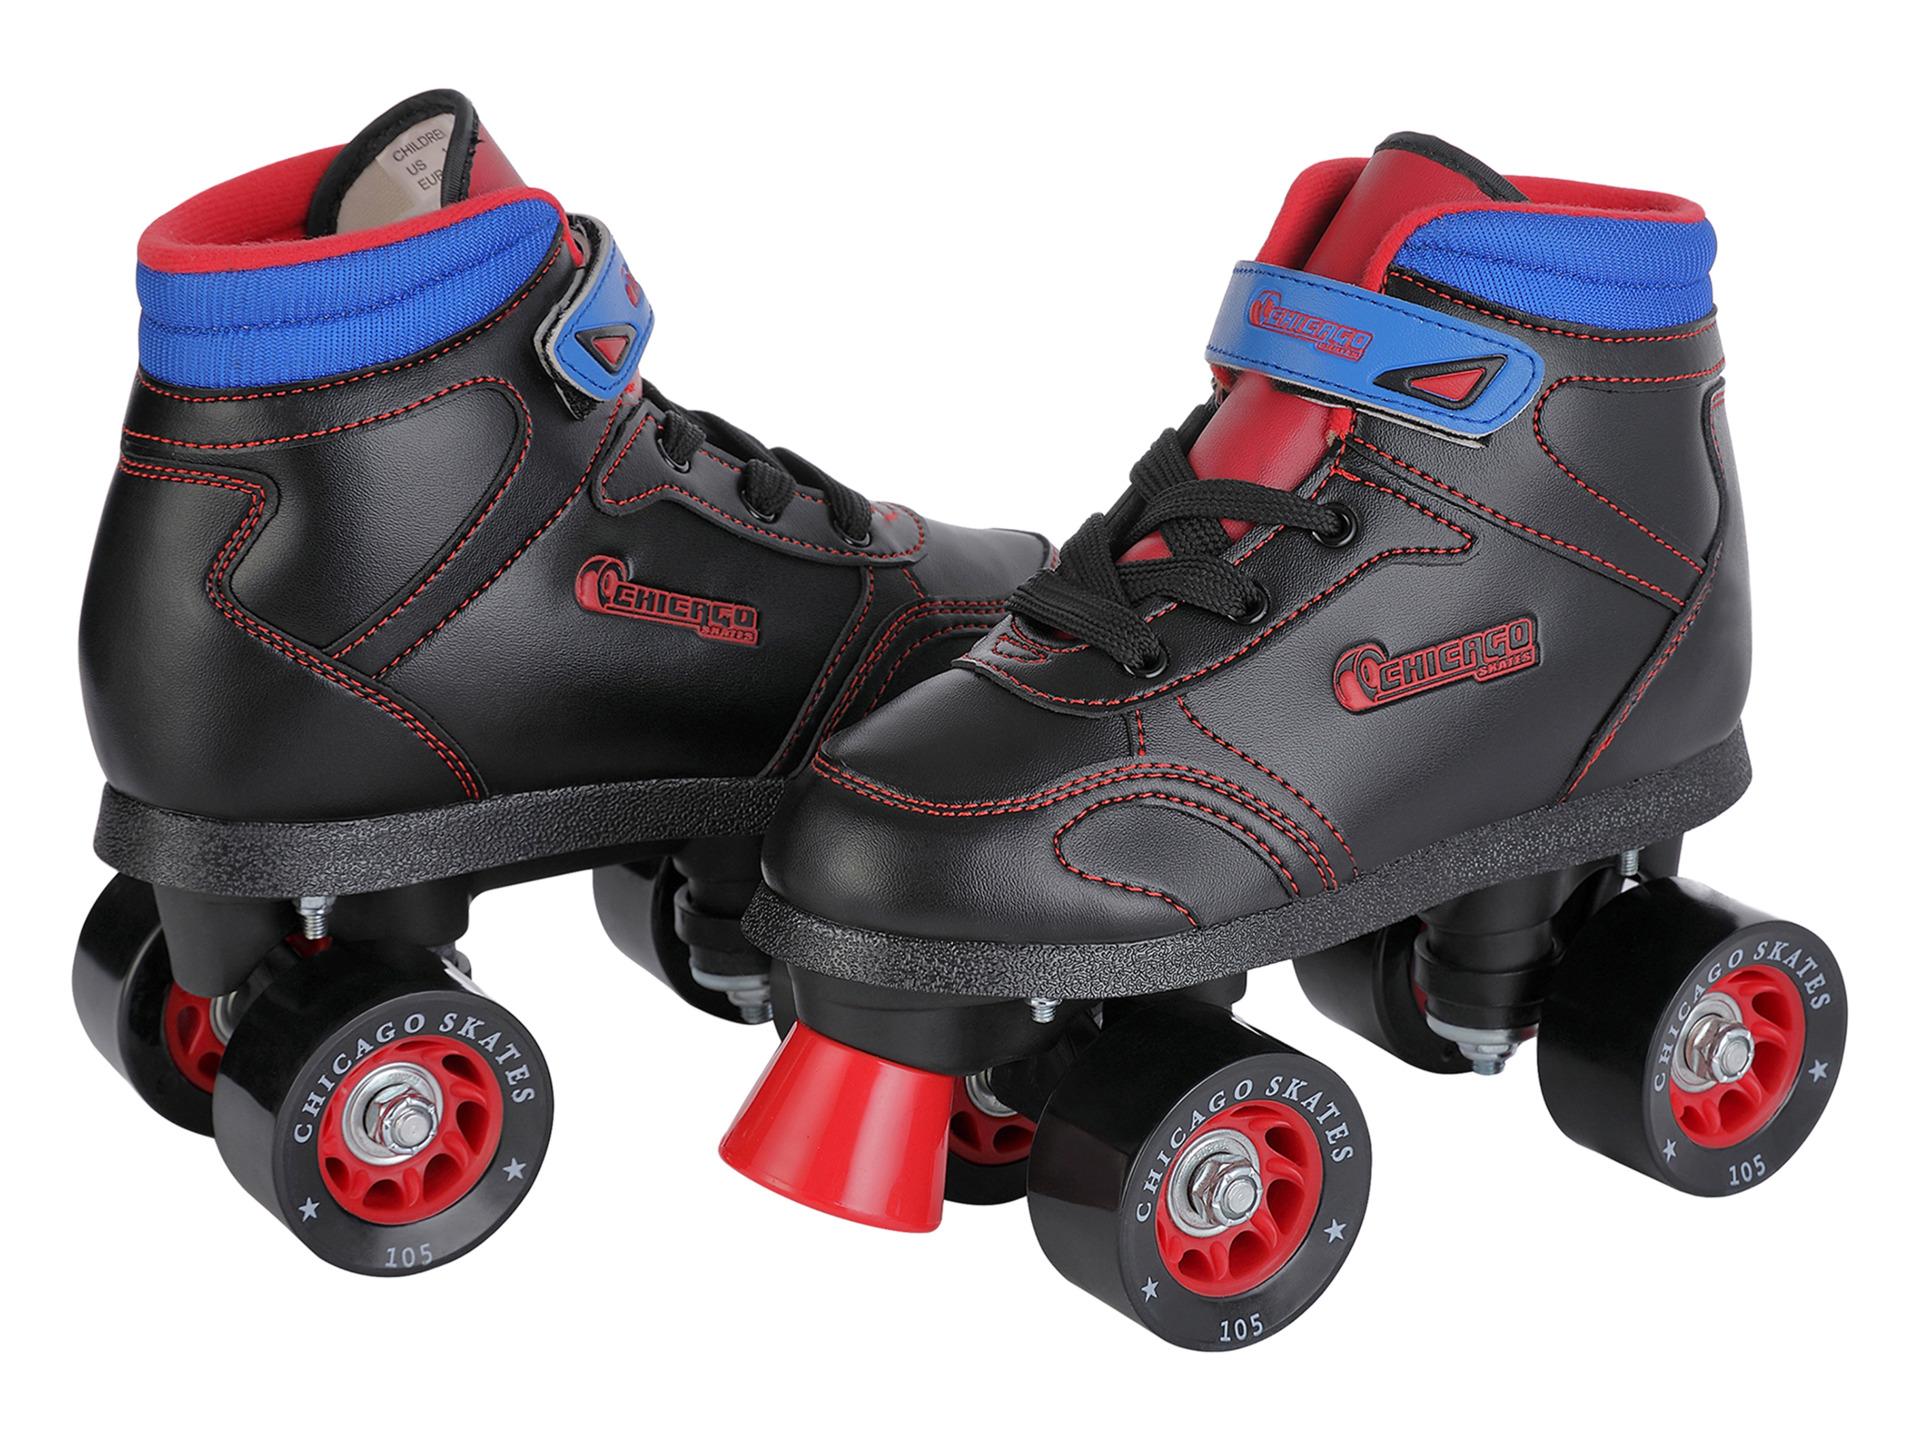 Roller skates las vegas - Chicago Skates Sidewalk Skate Little Kid Big Kid